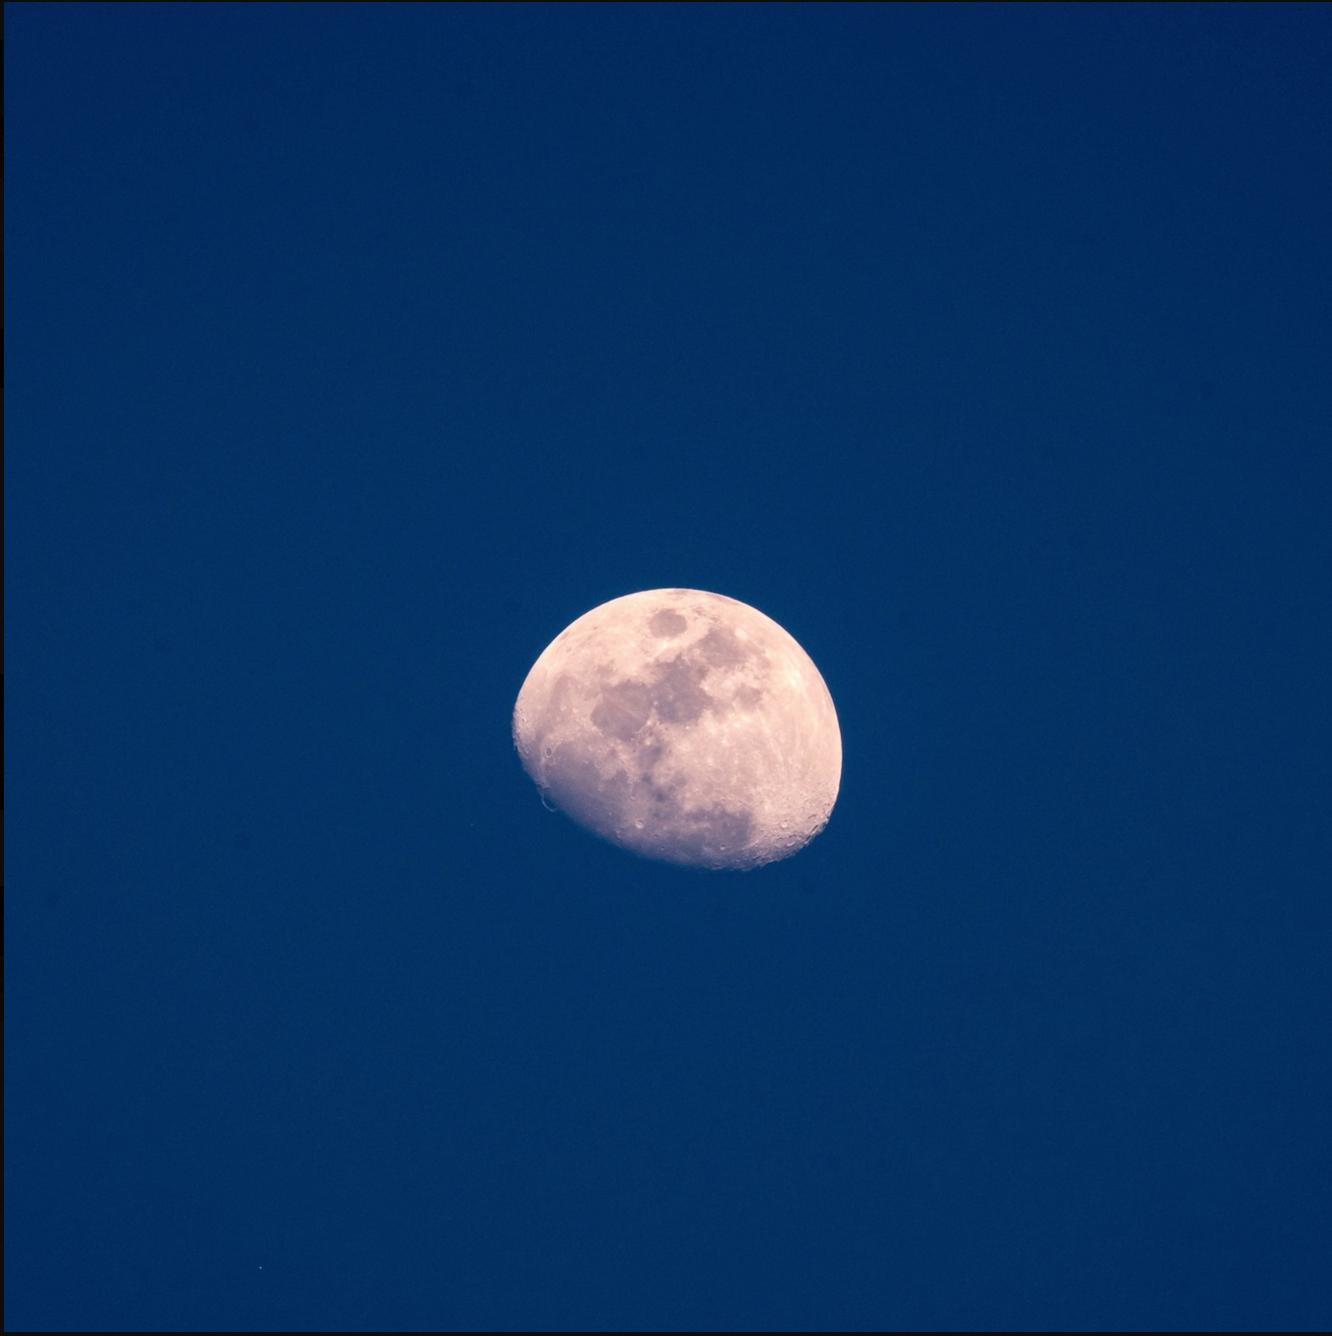 An epic moon shot taken in California's Joshua Tree -- no zoom! Just an awesome Fujifilm 100-400 lens. Epic.